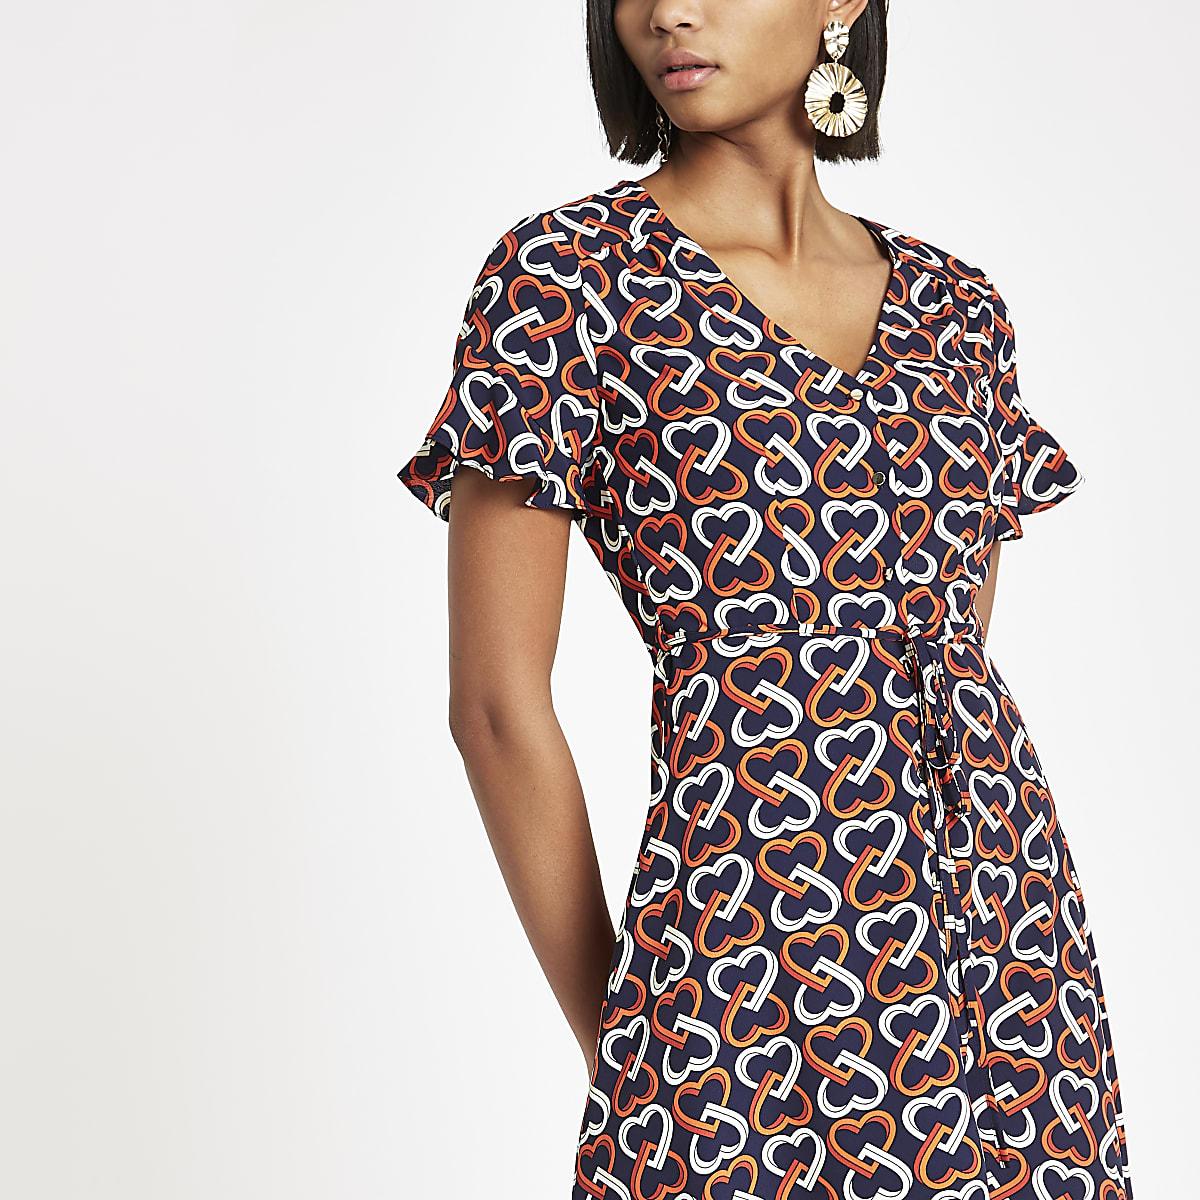 753af35ea9d3 Navy heart print tie waist tea dress - Swing Dresses - Dresses - women